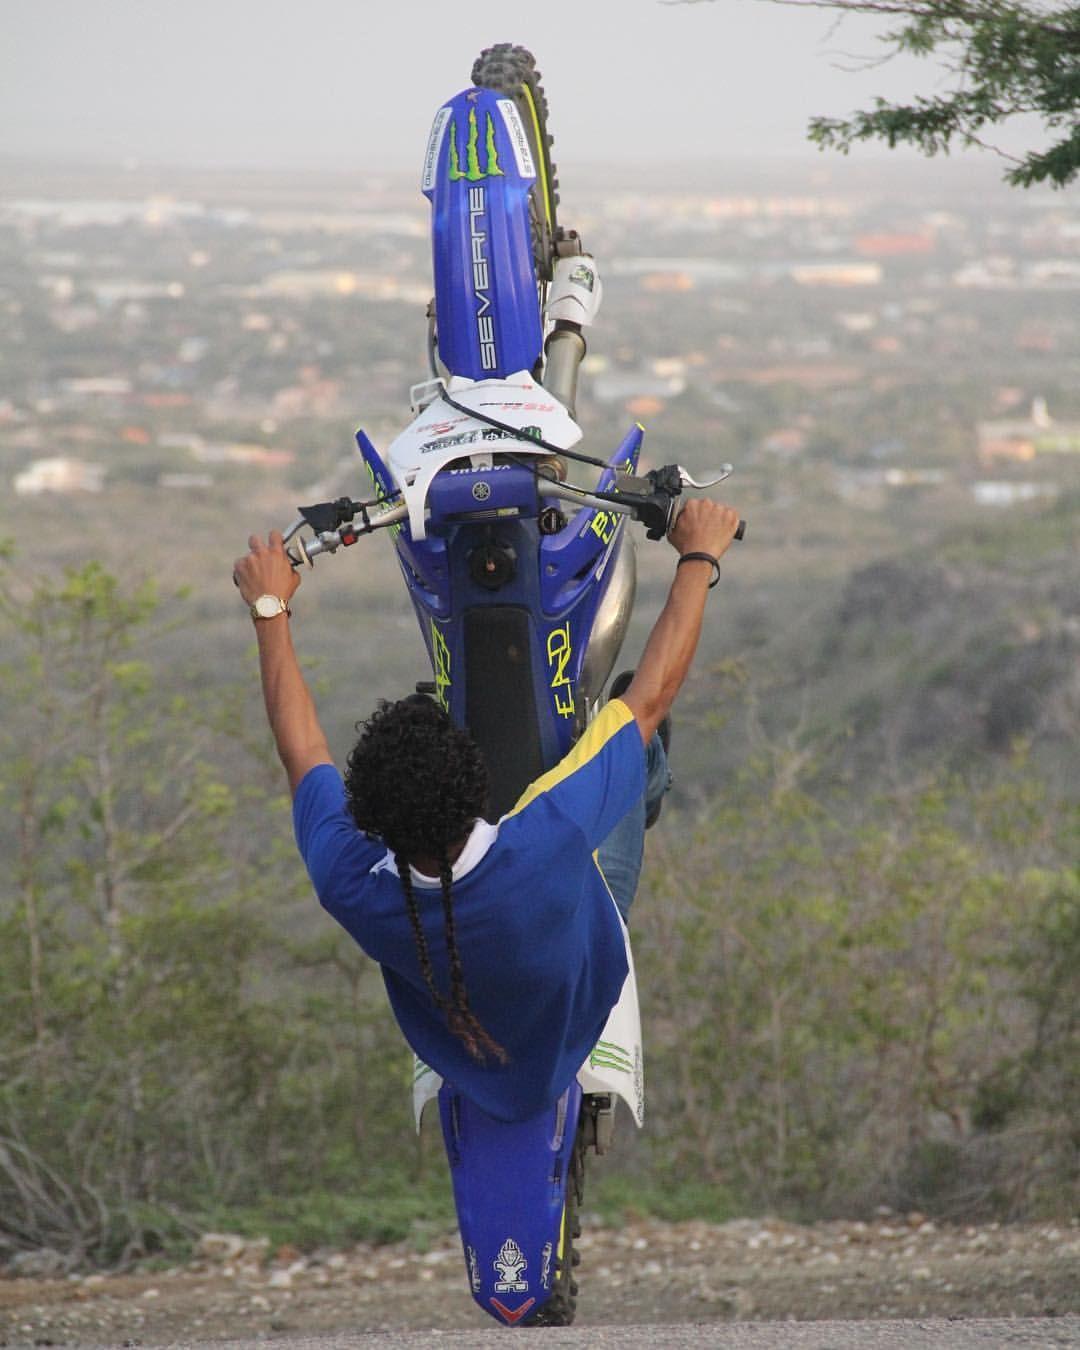 Epingle Sur Stunt Life